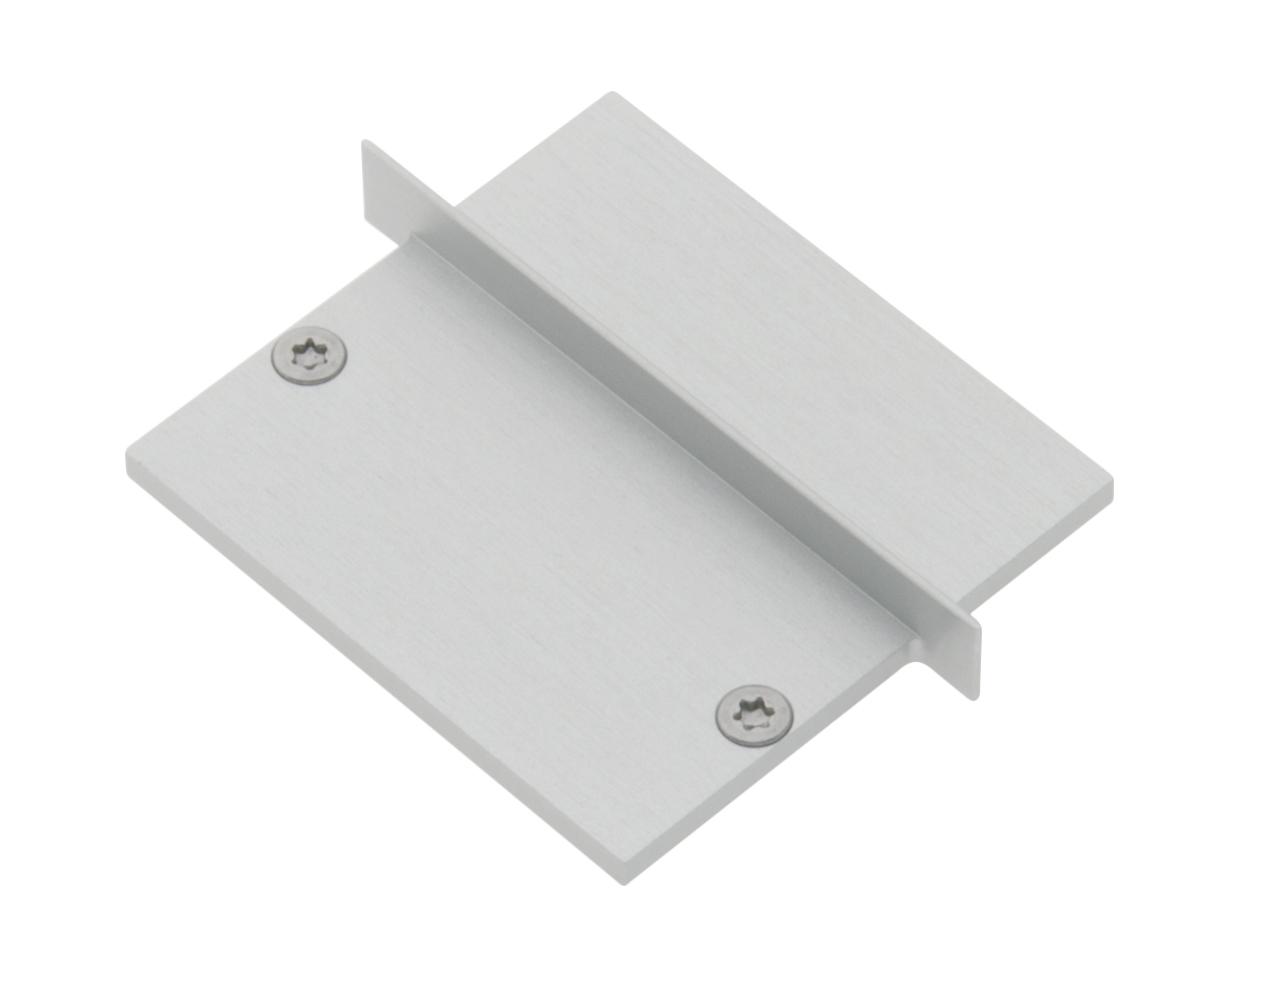 1 Stk Profil Endkappe MFJ Eckig geschlossen inkl. Schrauben LIEK005920